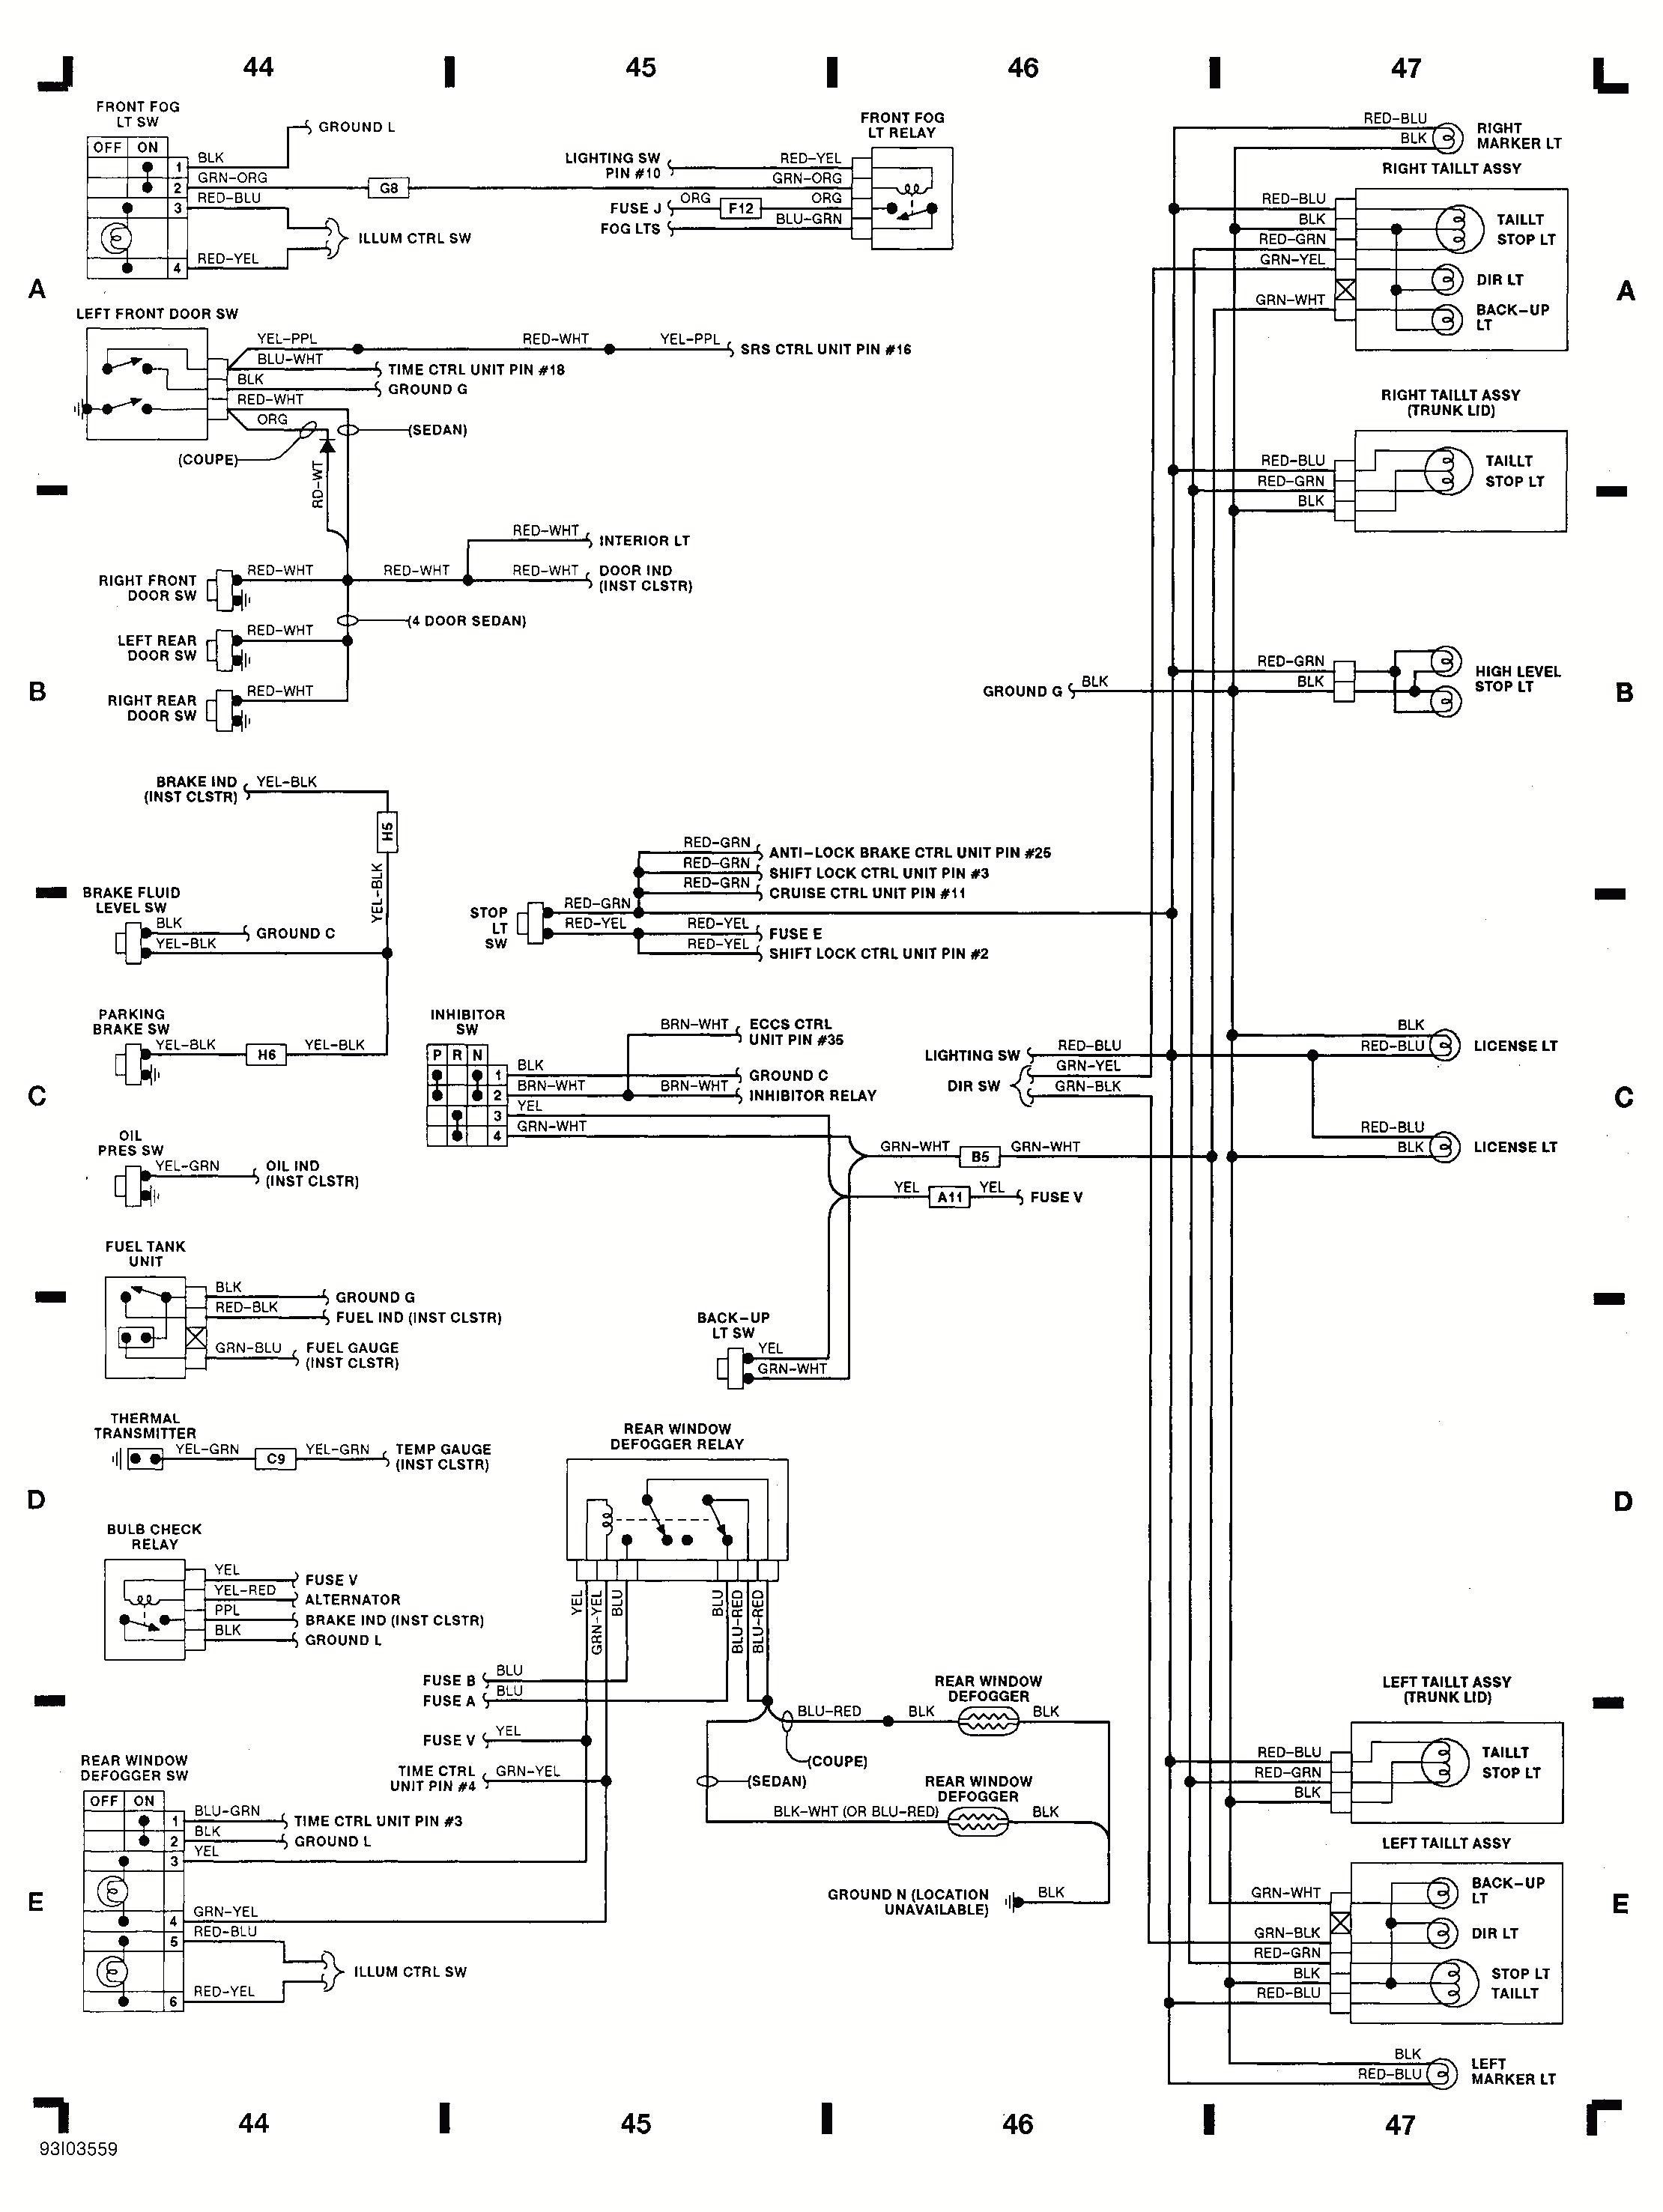 Nissan Cube Wiring Diagram - 2010 Camaro Engine Wiring Diagram -  yamaha-phazer.nescafe.jeanjaures37.frWiring Diagram Resource